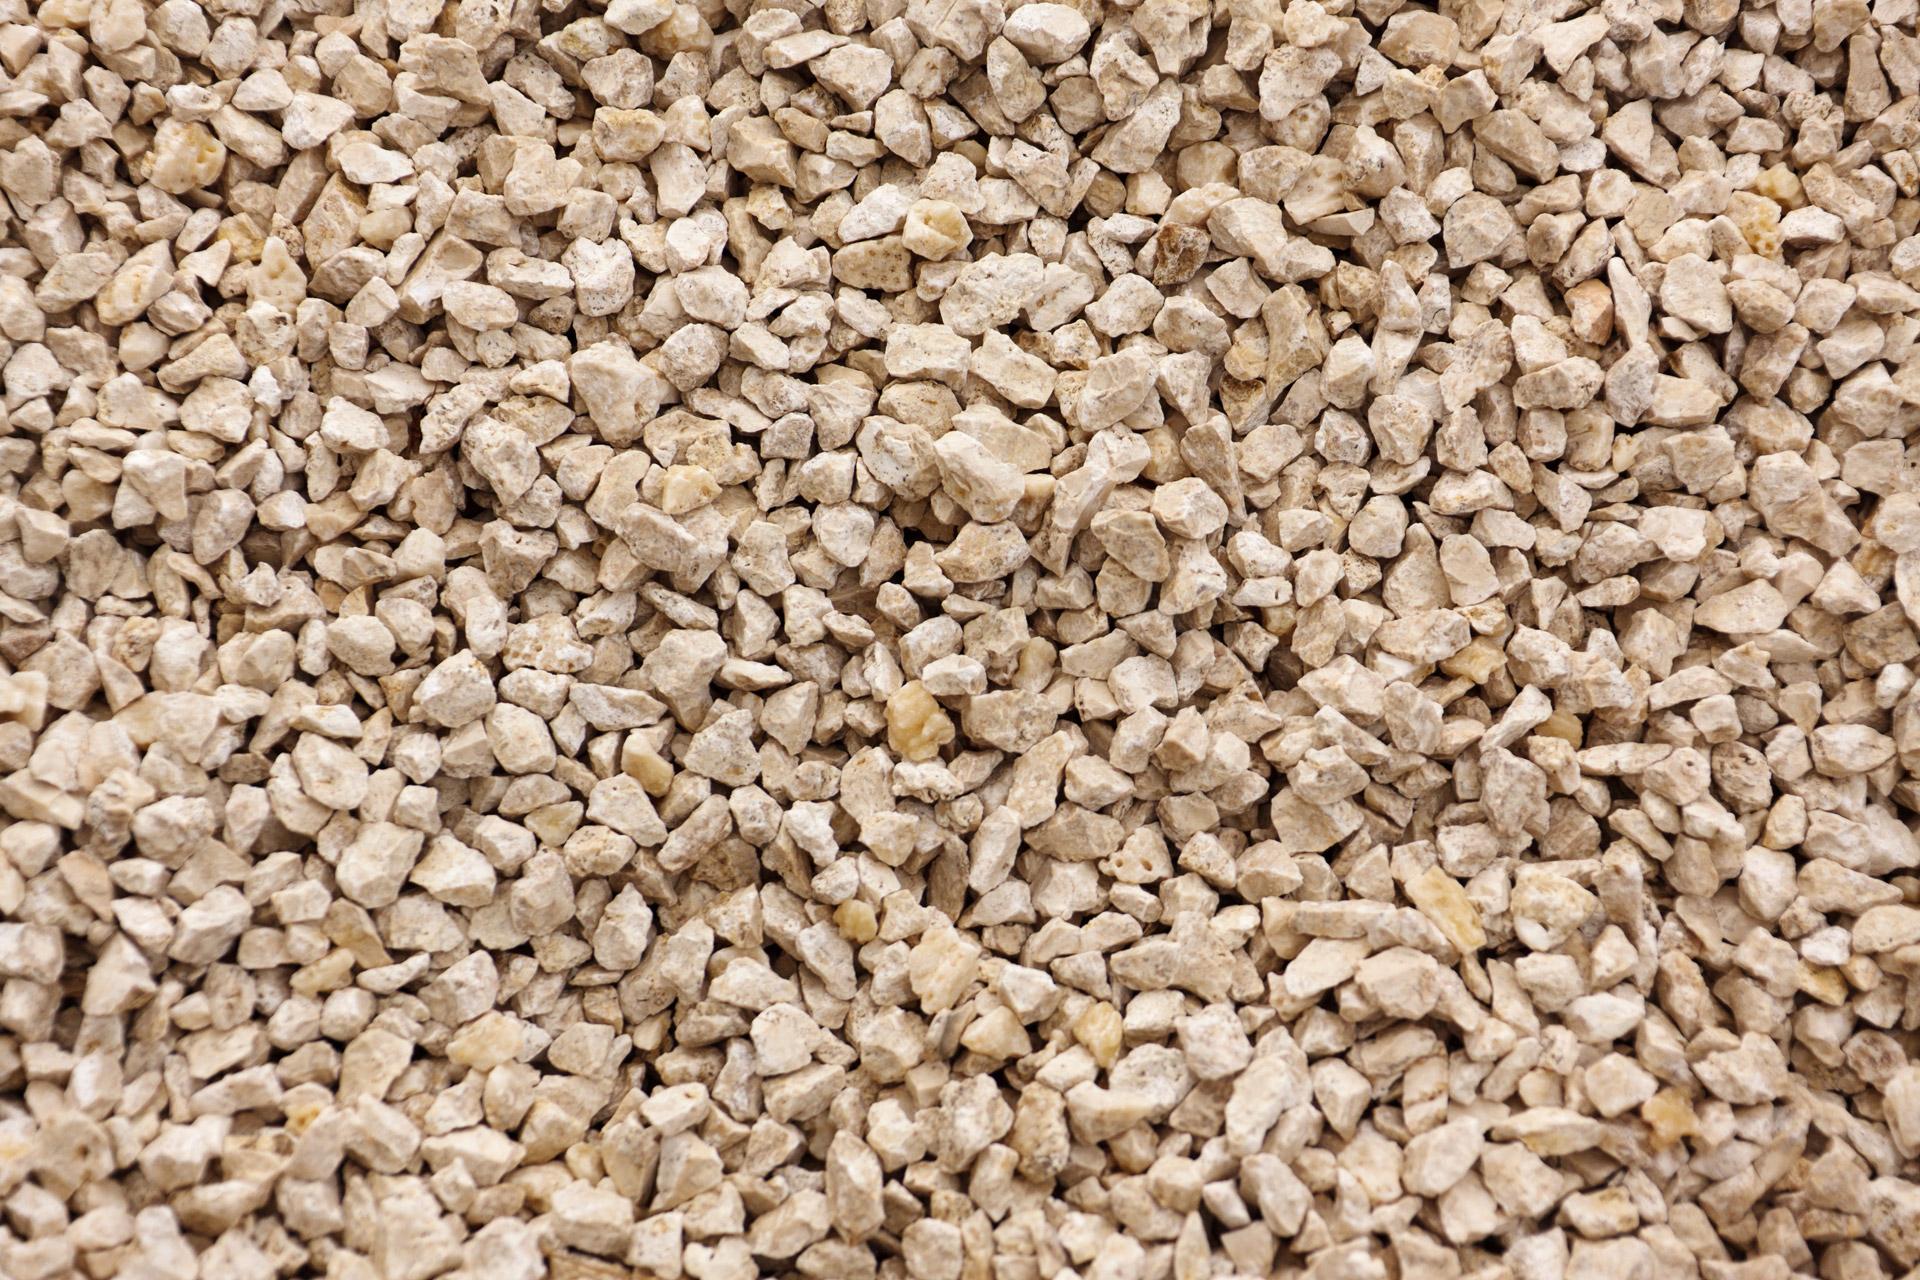 Gravel Texture Free Stock Photo - Public Domain Pictures